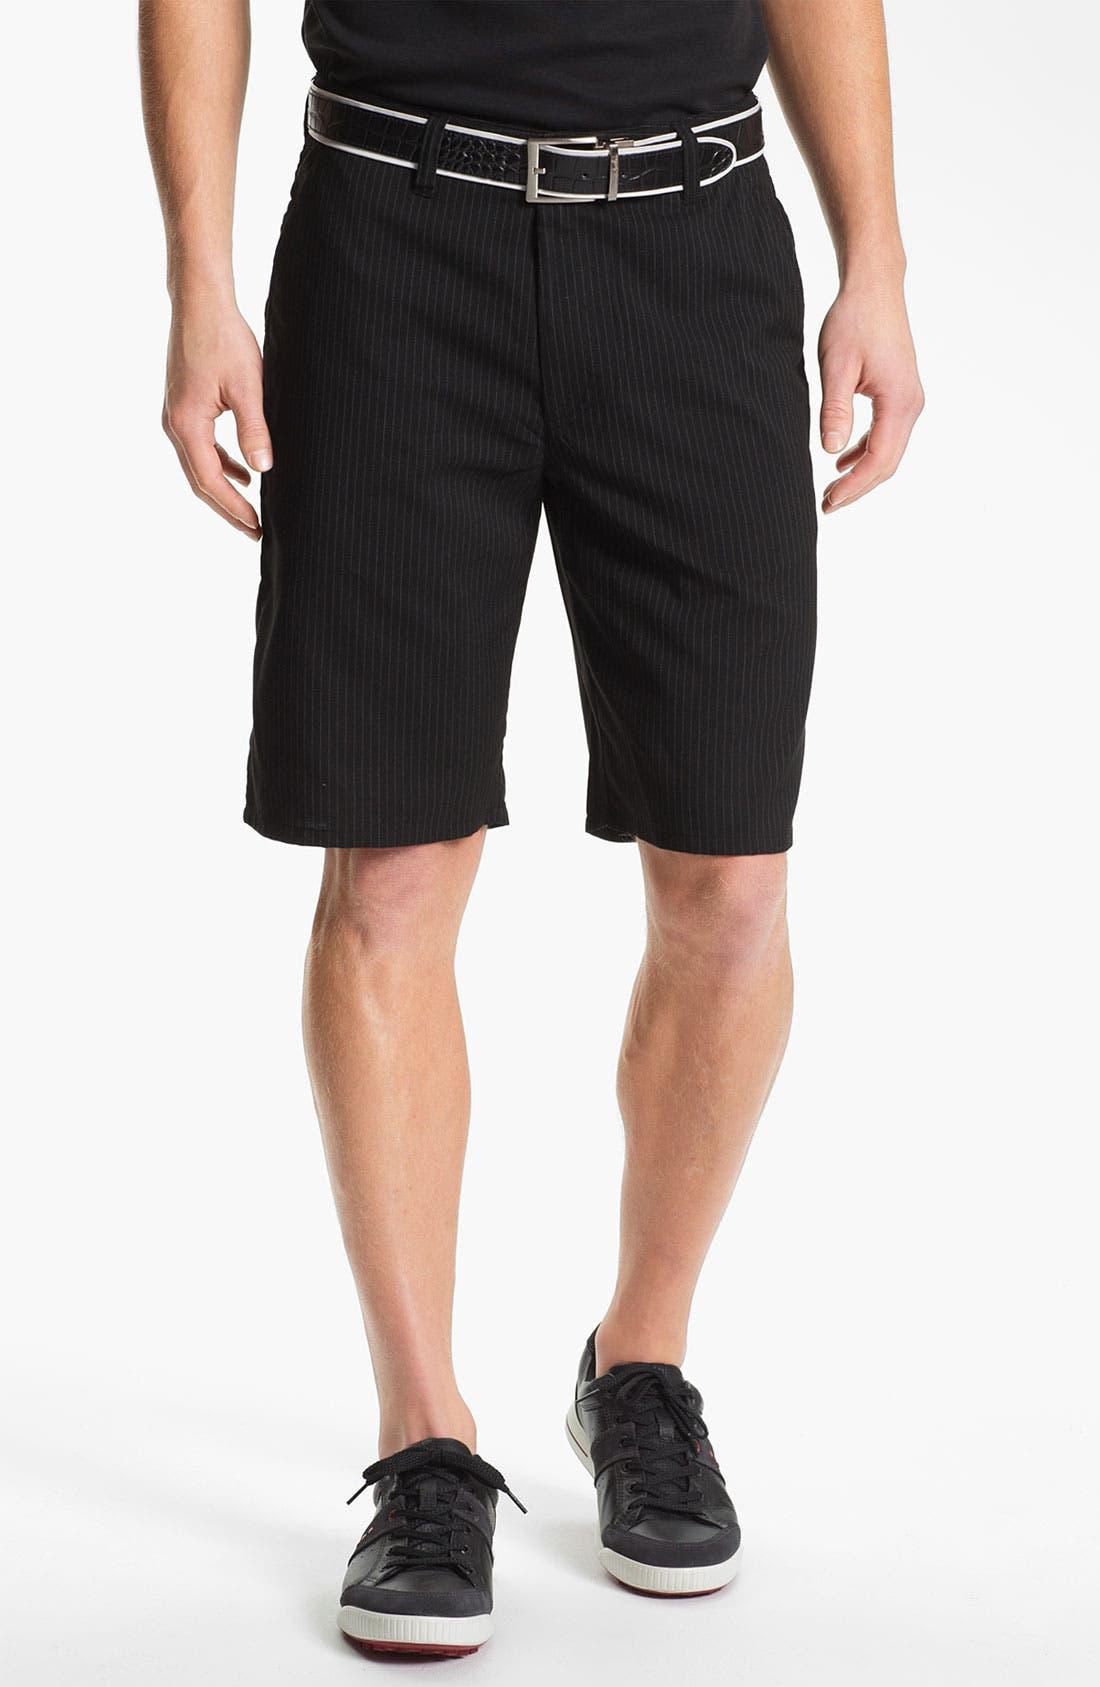 Alternate Image 1 Selected - Travis Mathew Flat Front Golf Shorts